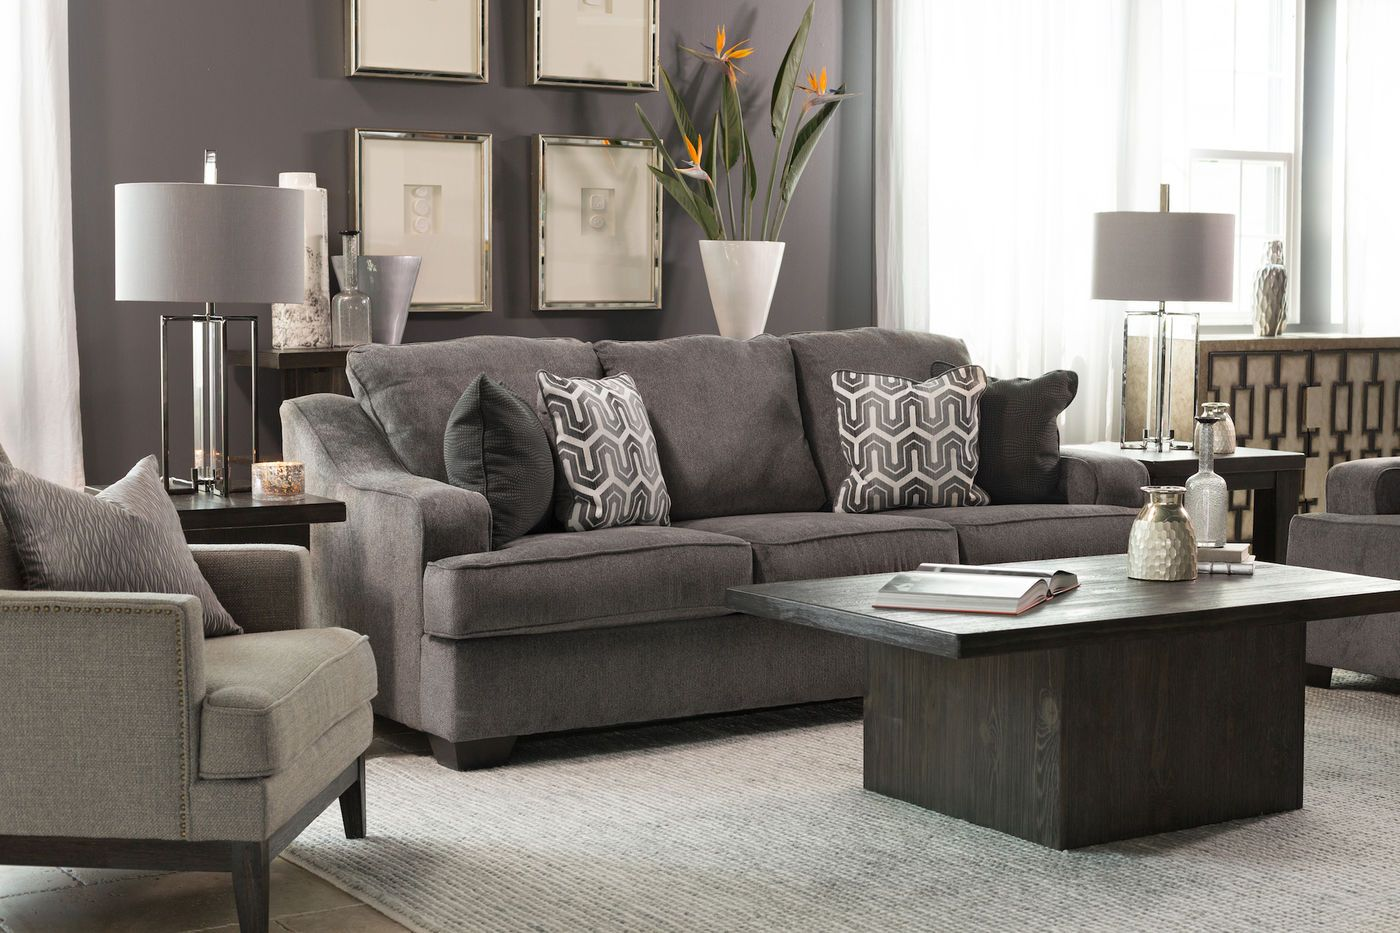 Ashley Gilmer Gunmetal Sofa in 2019 | Small living rooms ...